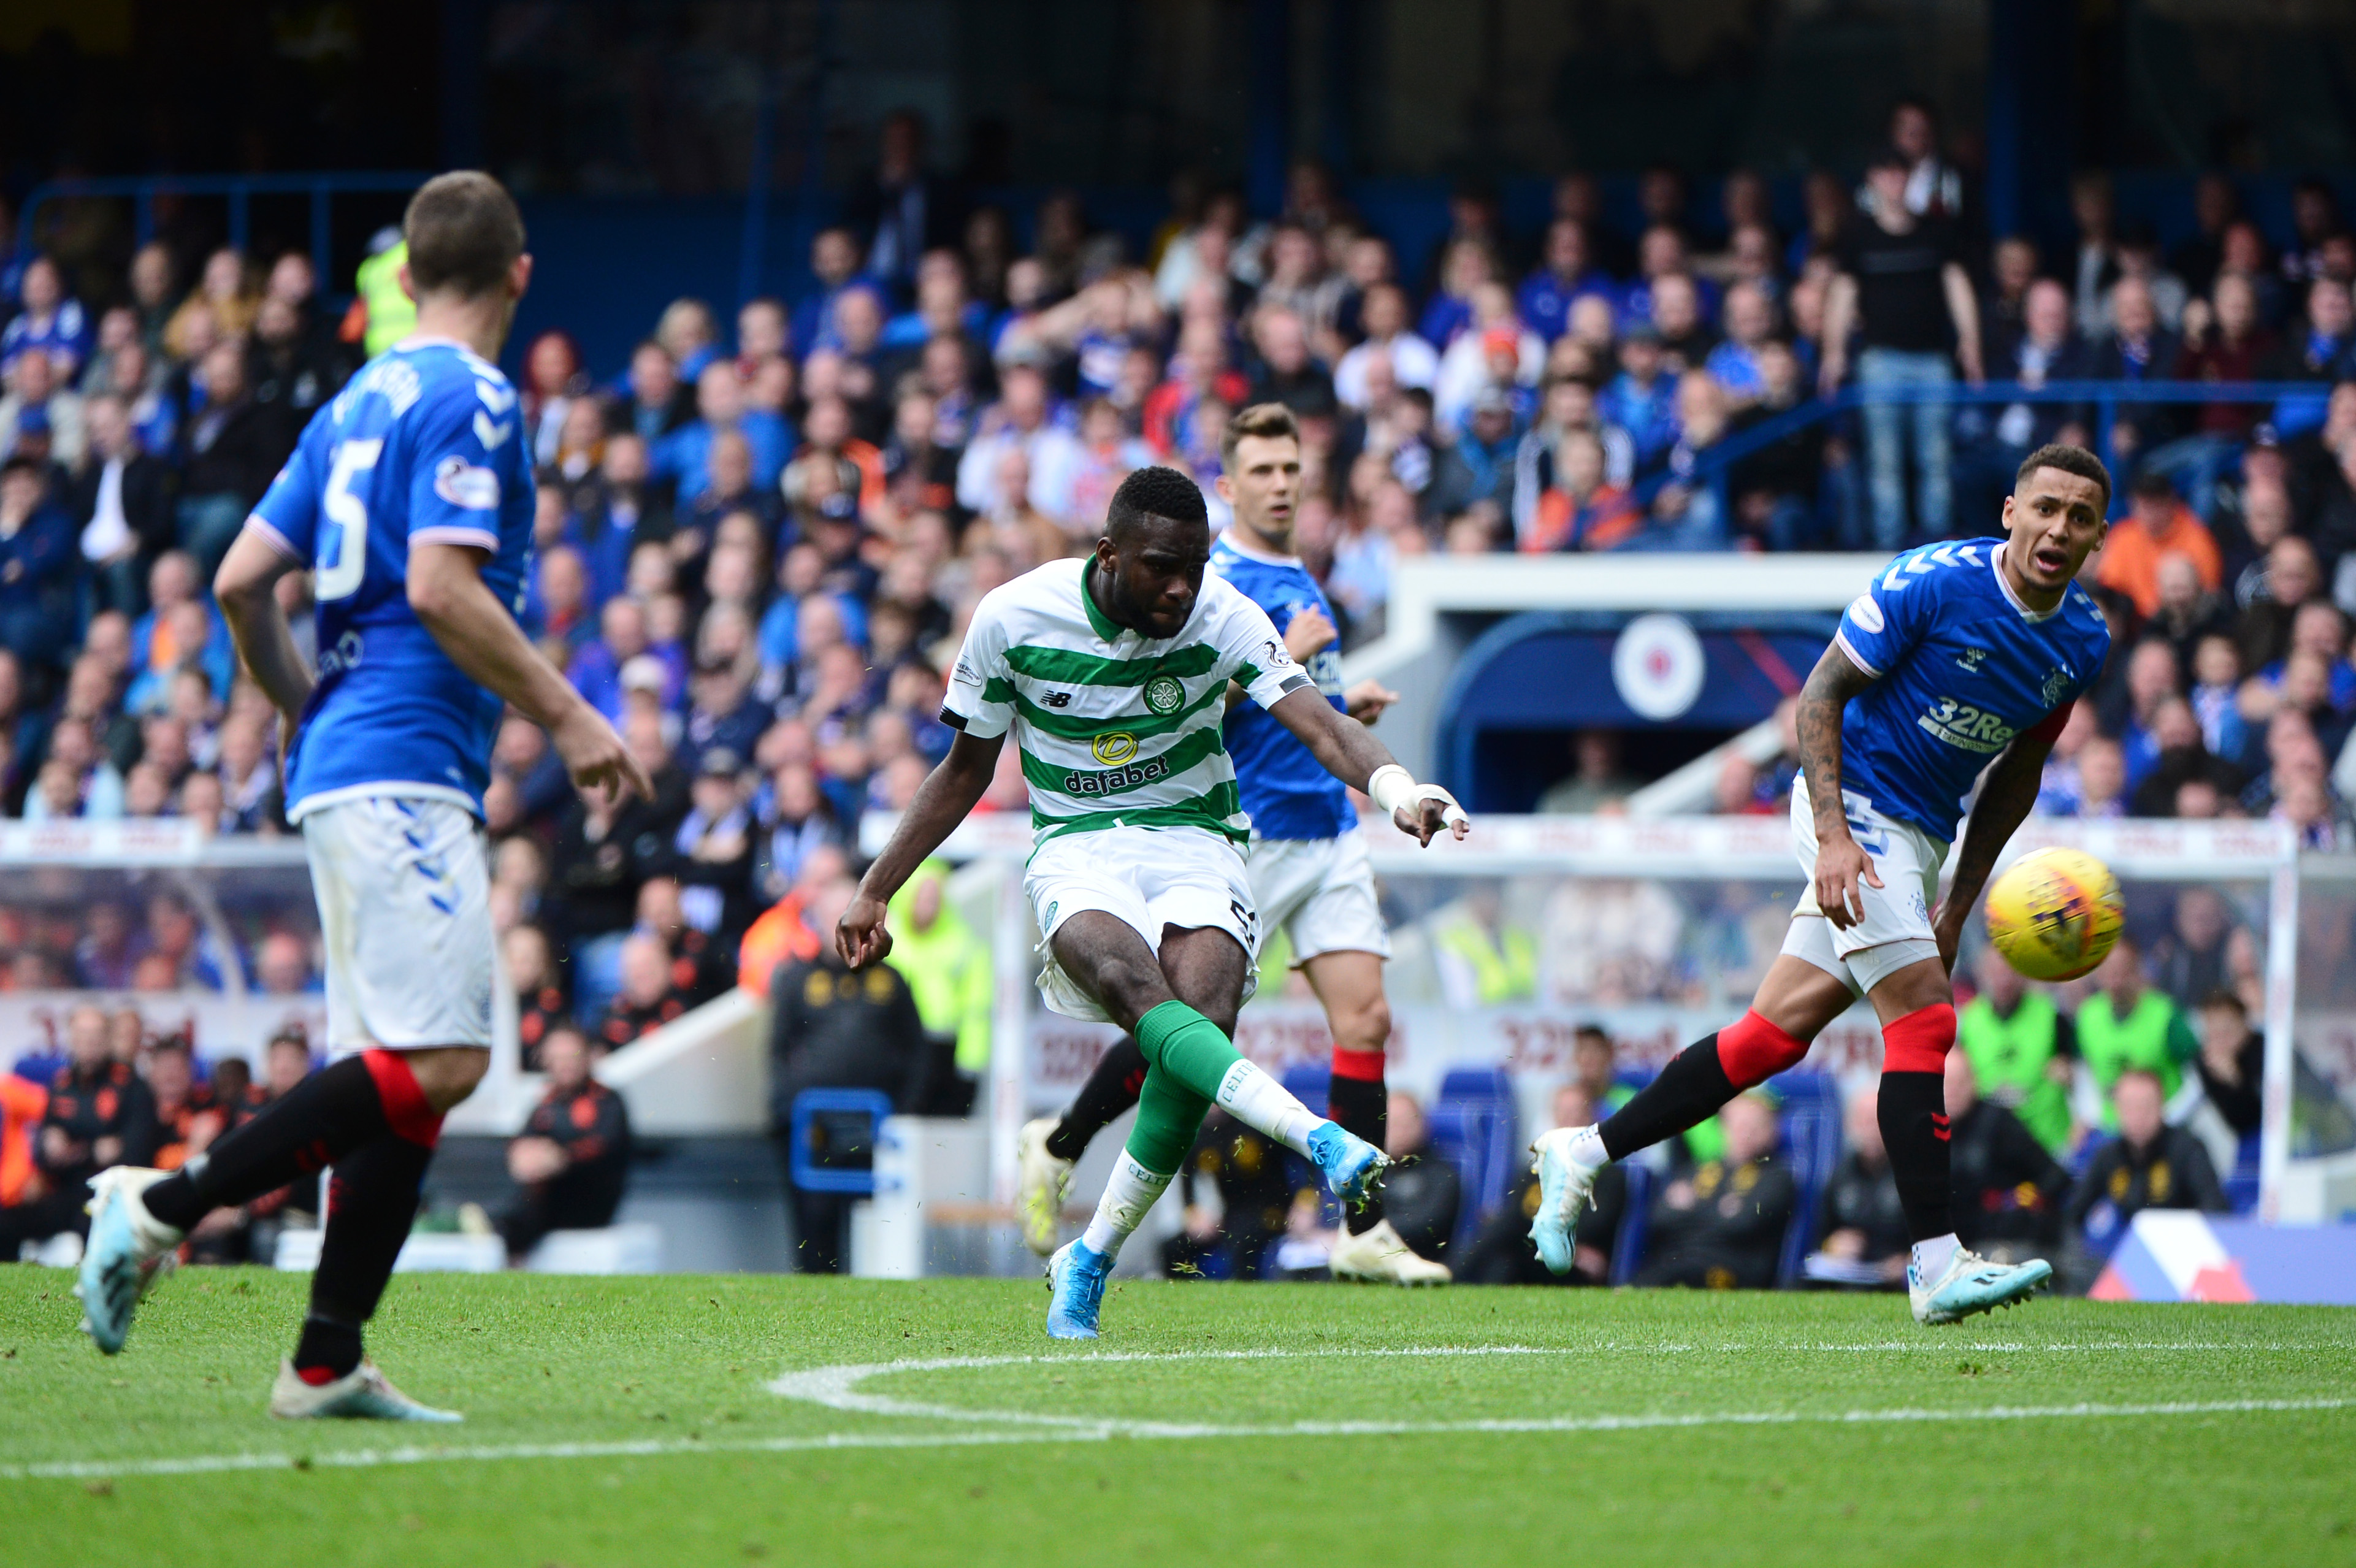 Rangers-v-celtic-ladbrokes-scottish-premiership